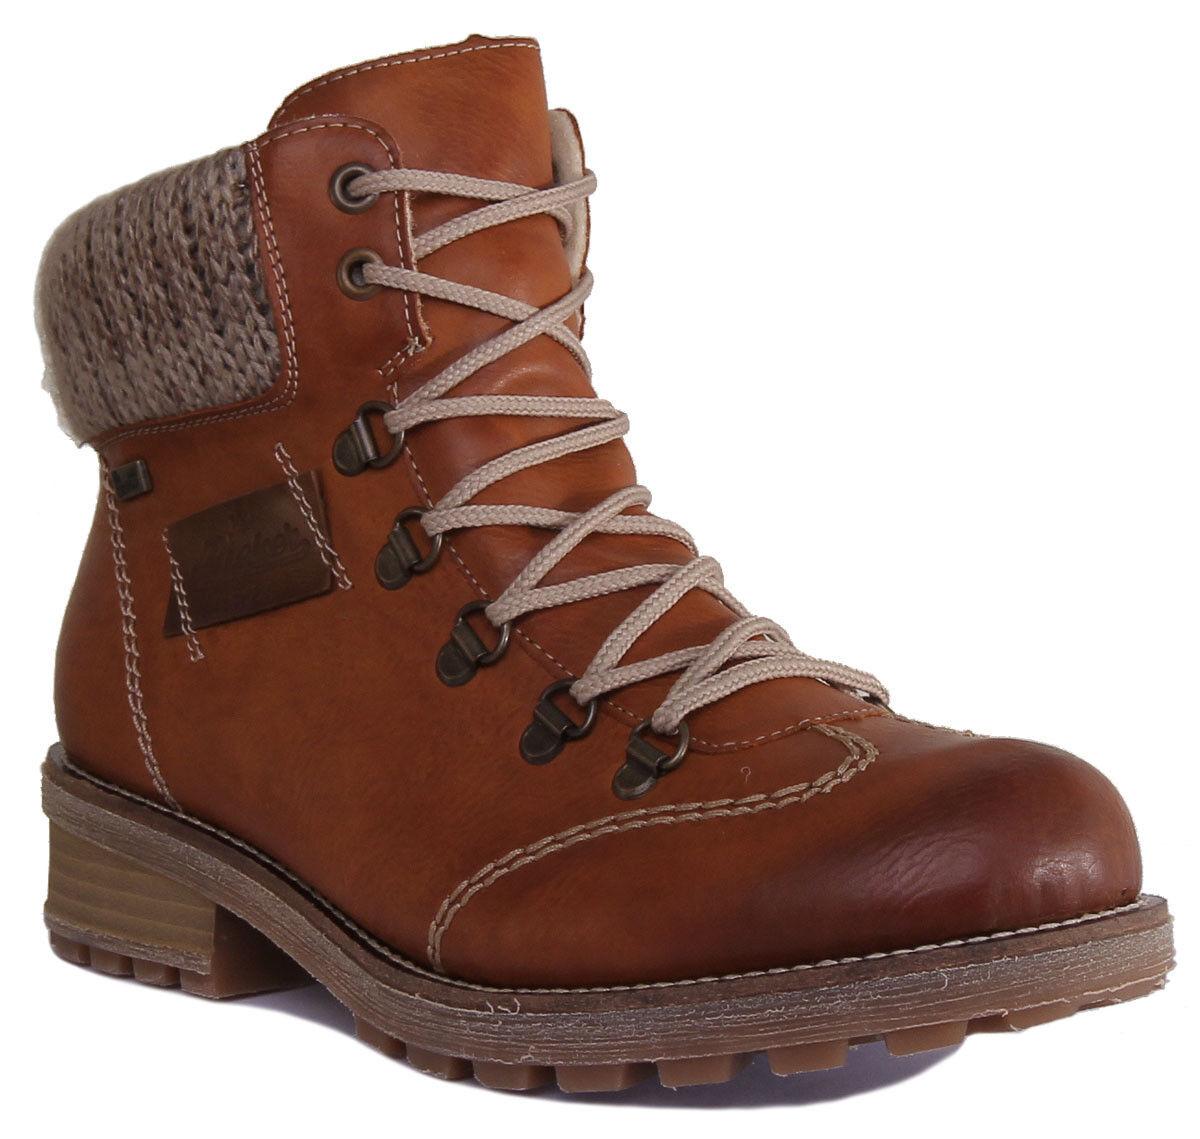 Rieker Z0444 24 Damens Lace up UK Tan Hiker Boot Größe UK up Siz e 3 - 8 3e7238